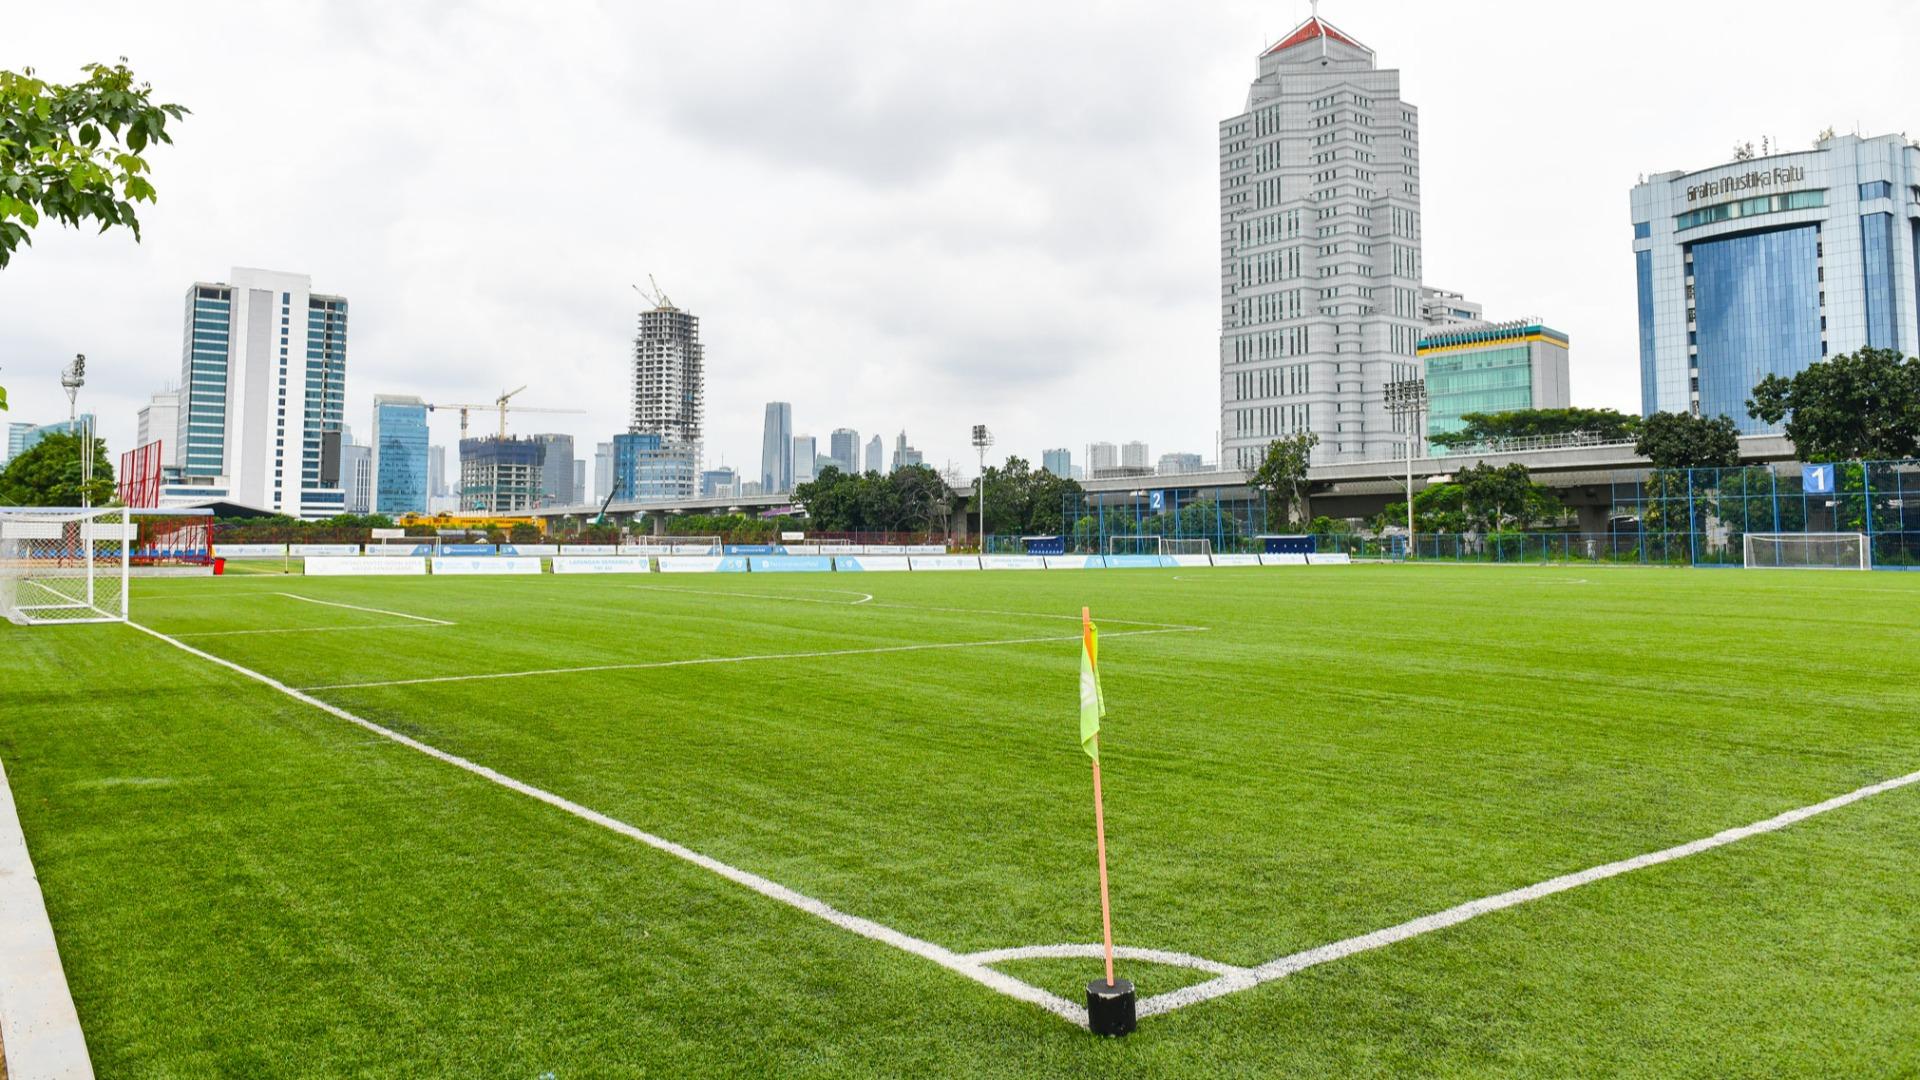 Pancoran Soccer Field / PSF